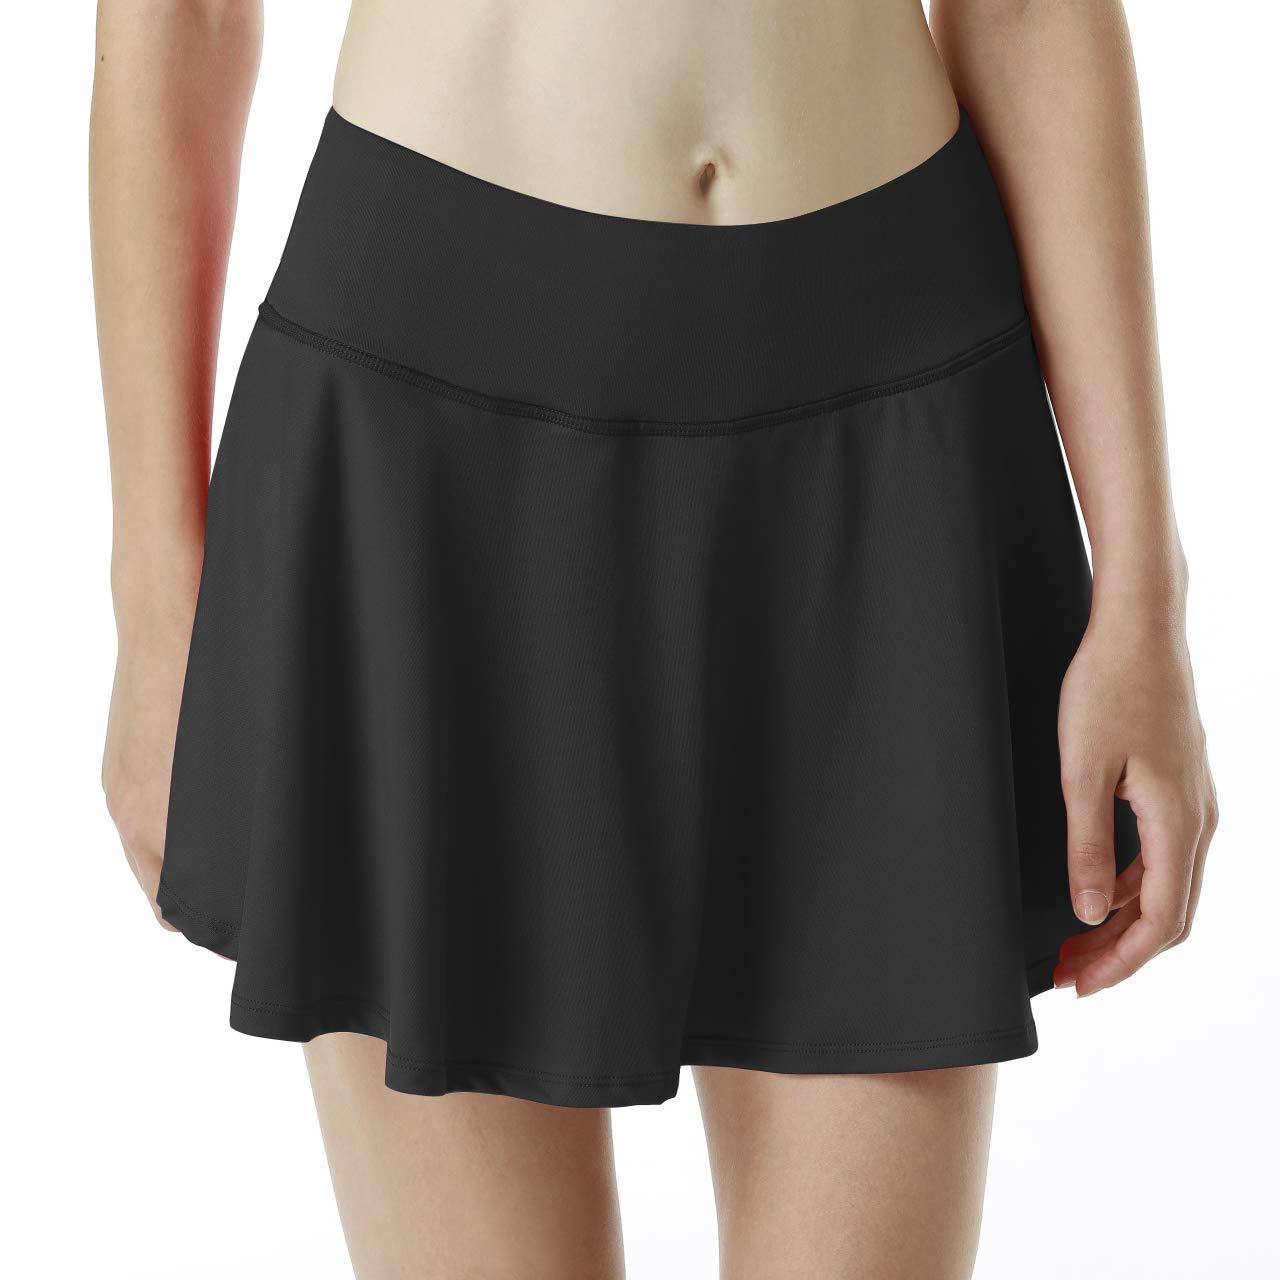 33d5e44be9 iooho Women's Athletic Tennis Skirt Running Golf Workout Skort with Pockets